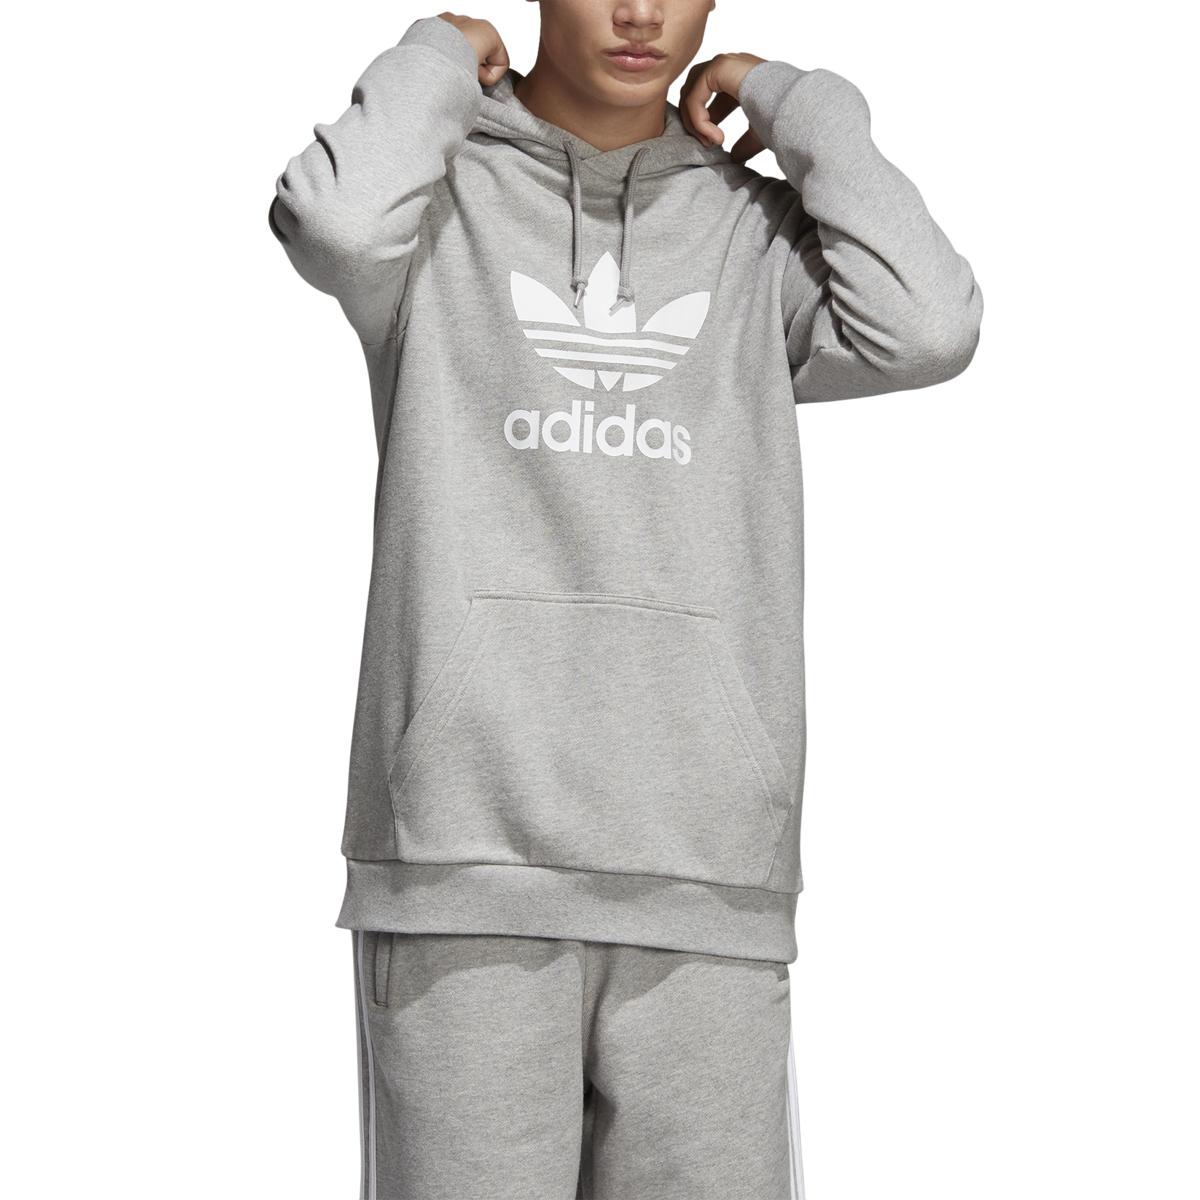 Adidas Trefoil Hoodie Grey Heather